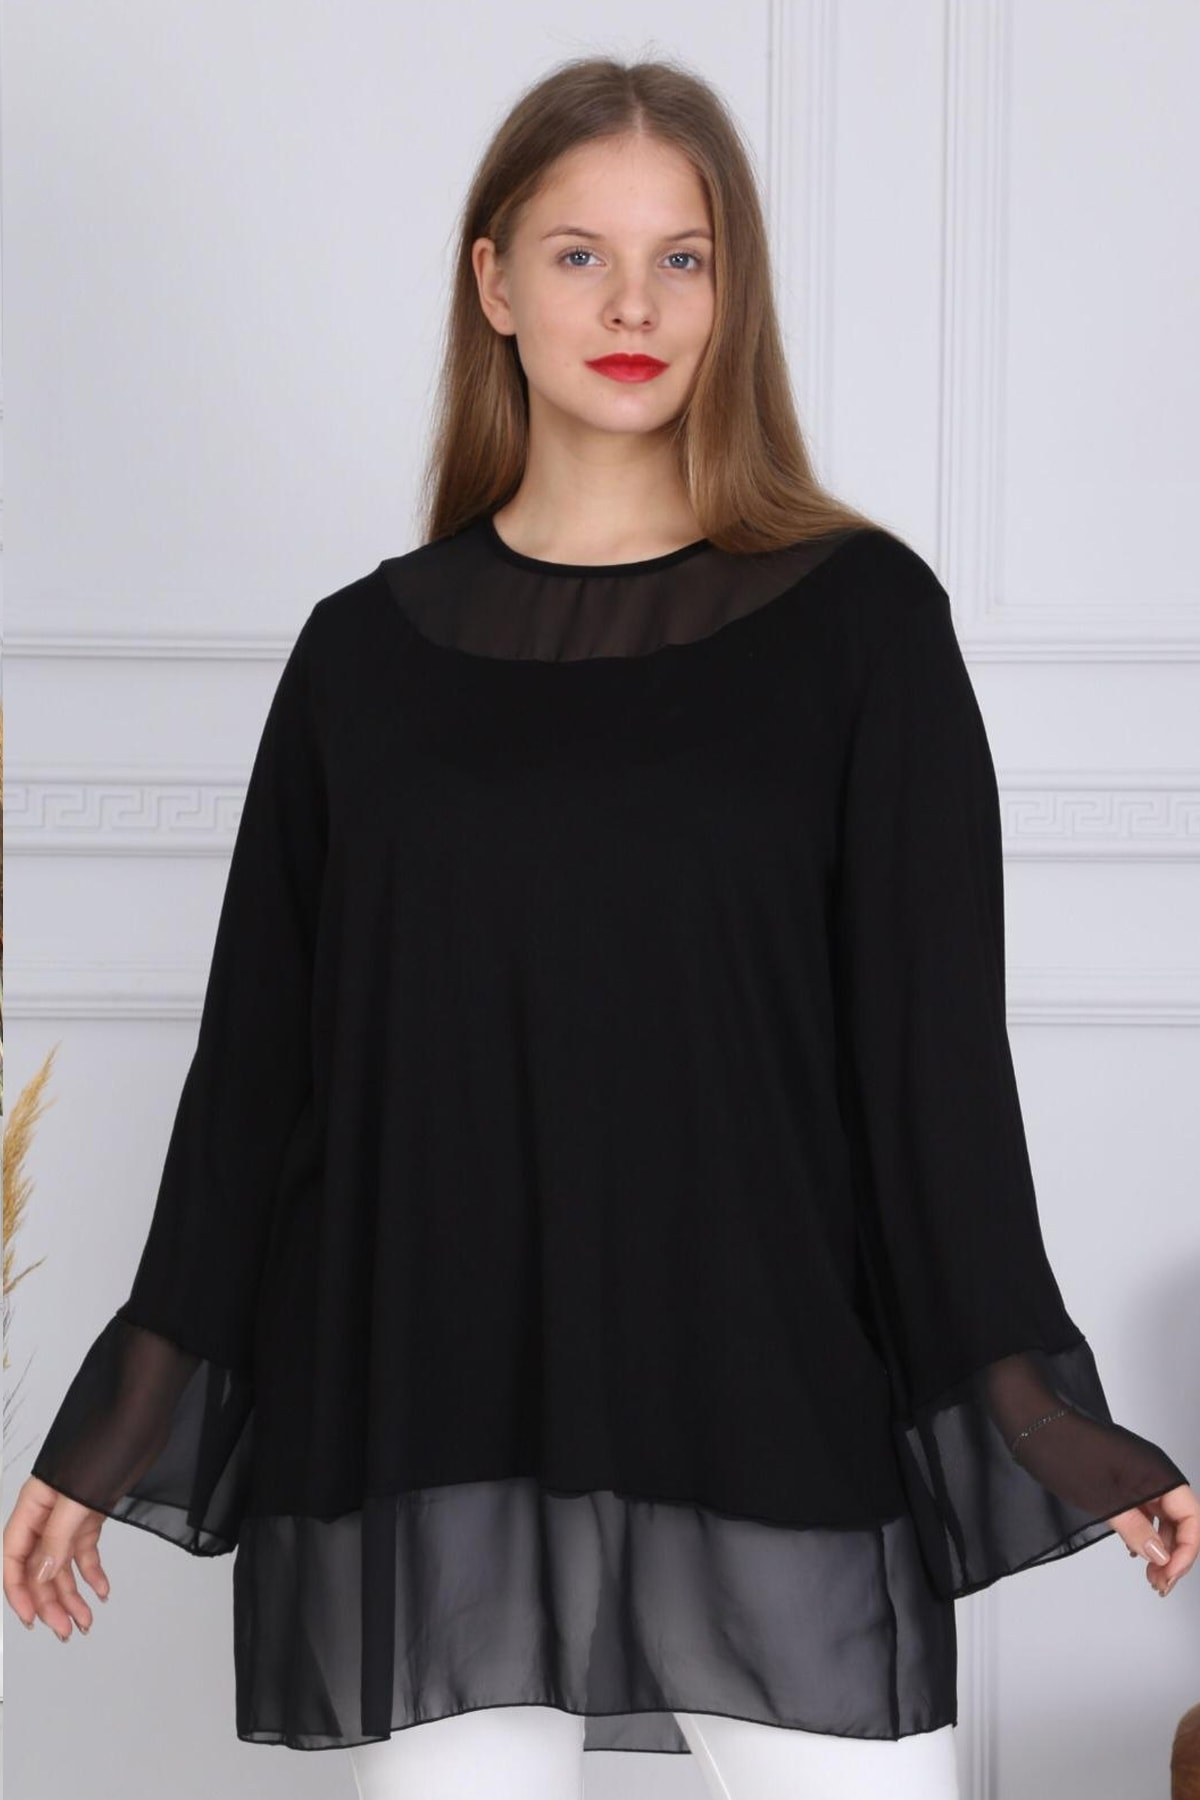 Kol Ve Yaka Şifon Detaylı Siyah Viskon Tunik Bluz